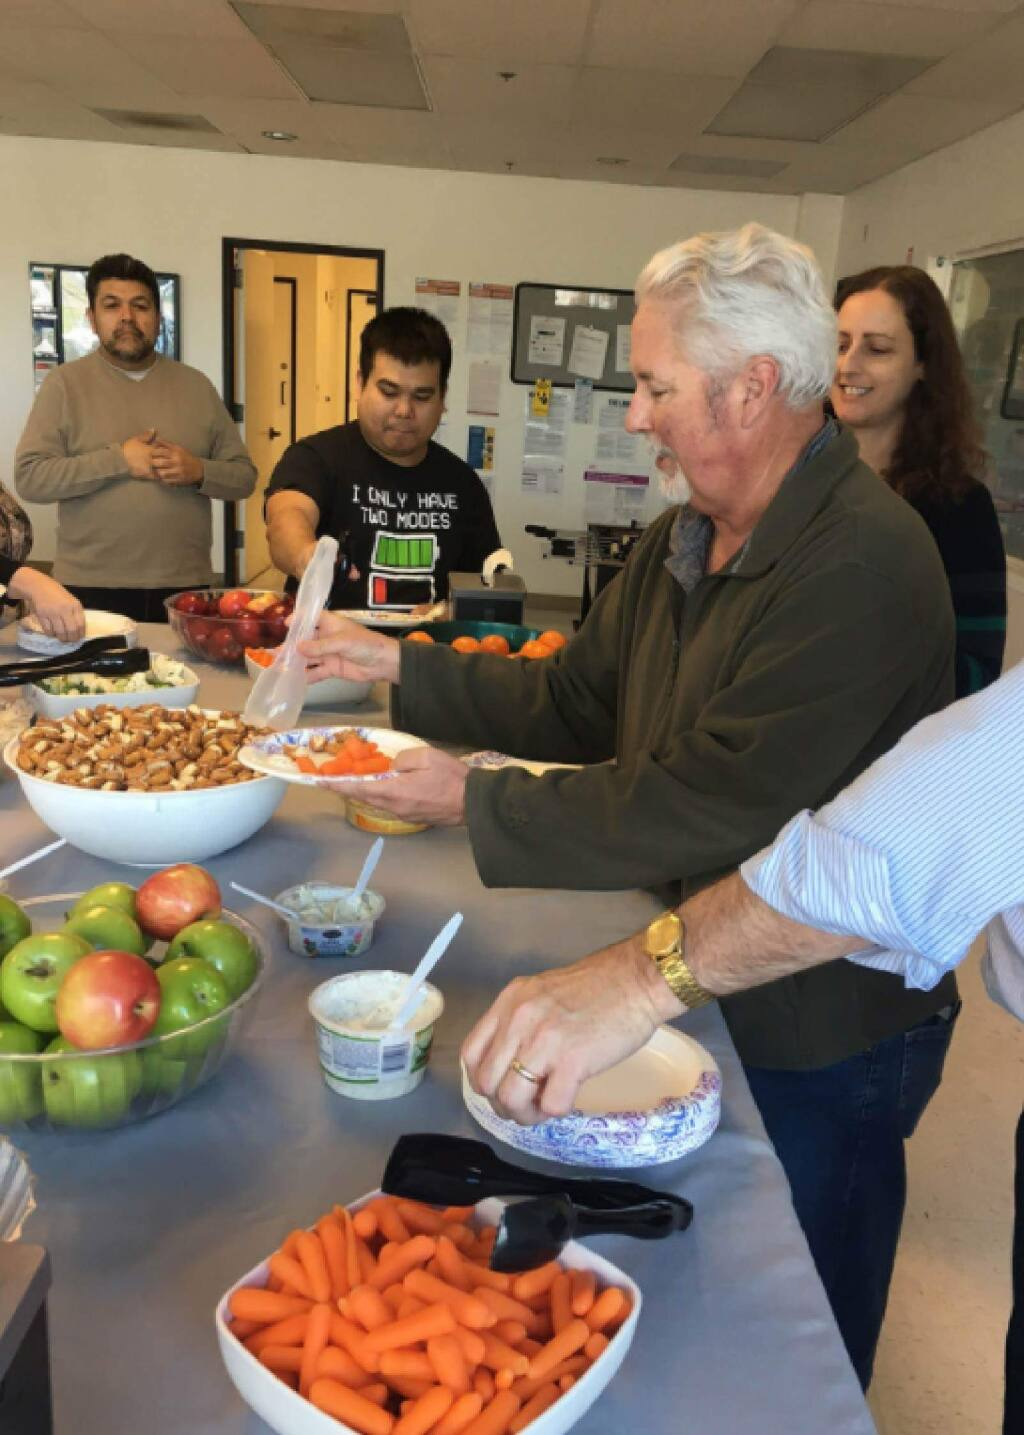 Employees of Workrite in Petaluma enjoy healthful meals at work. (WORKRITE)